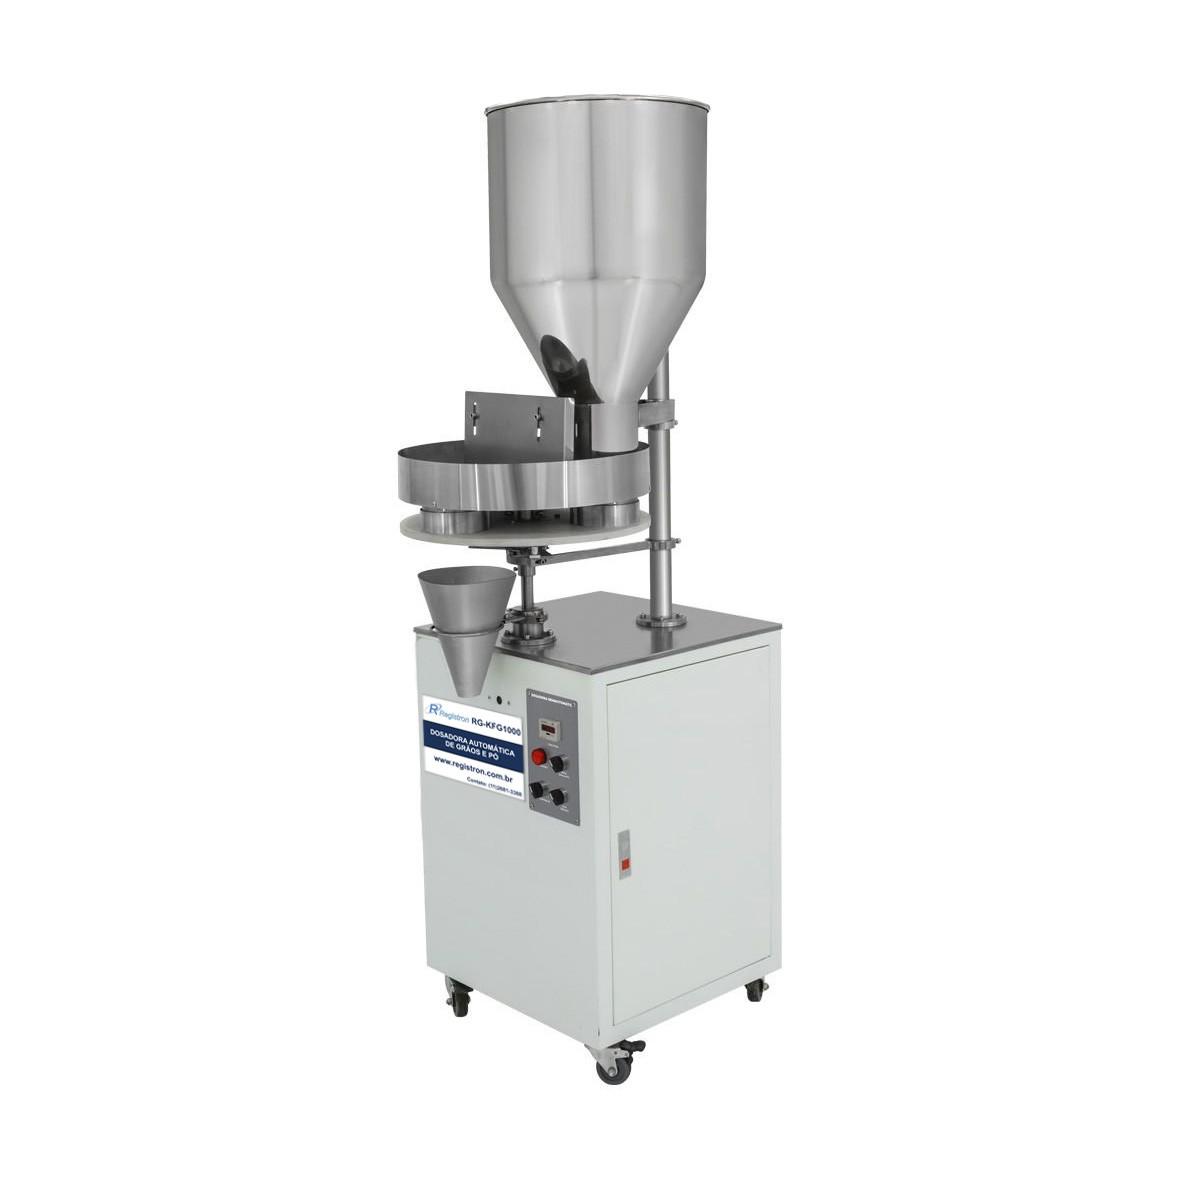 Dosadora Volumétrica Automática RG-KFG1000